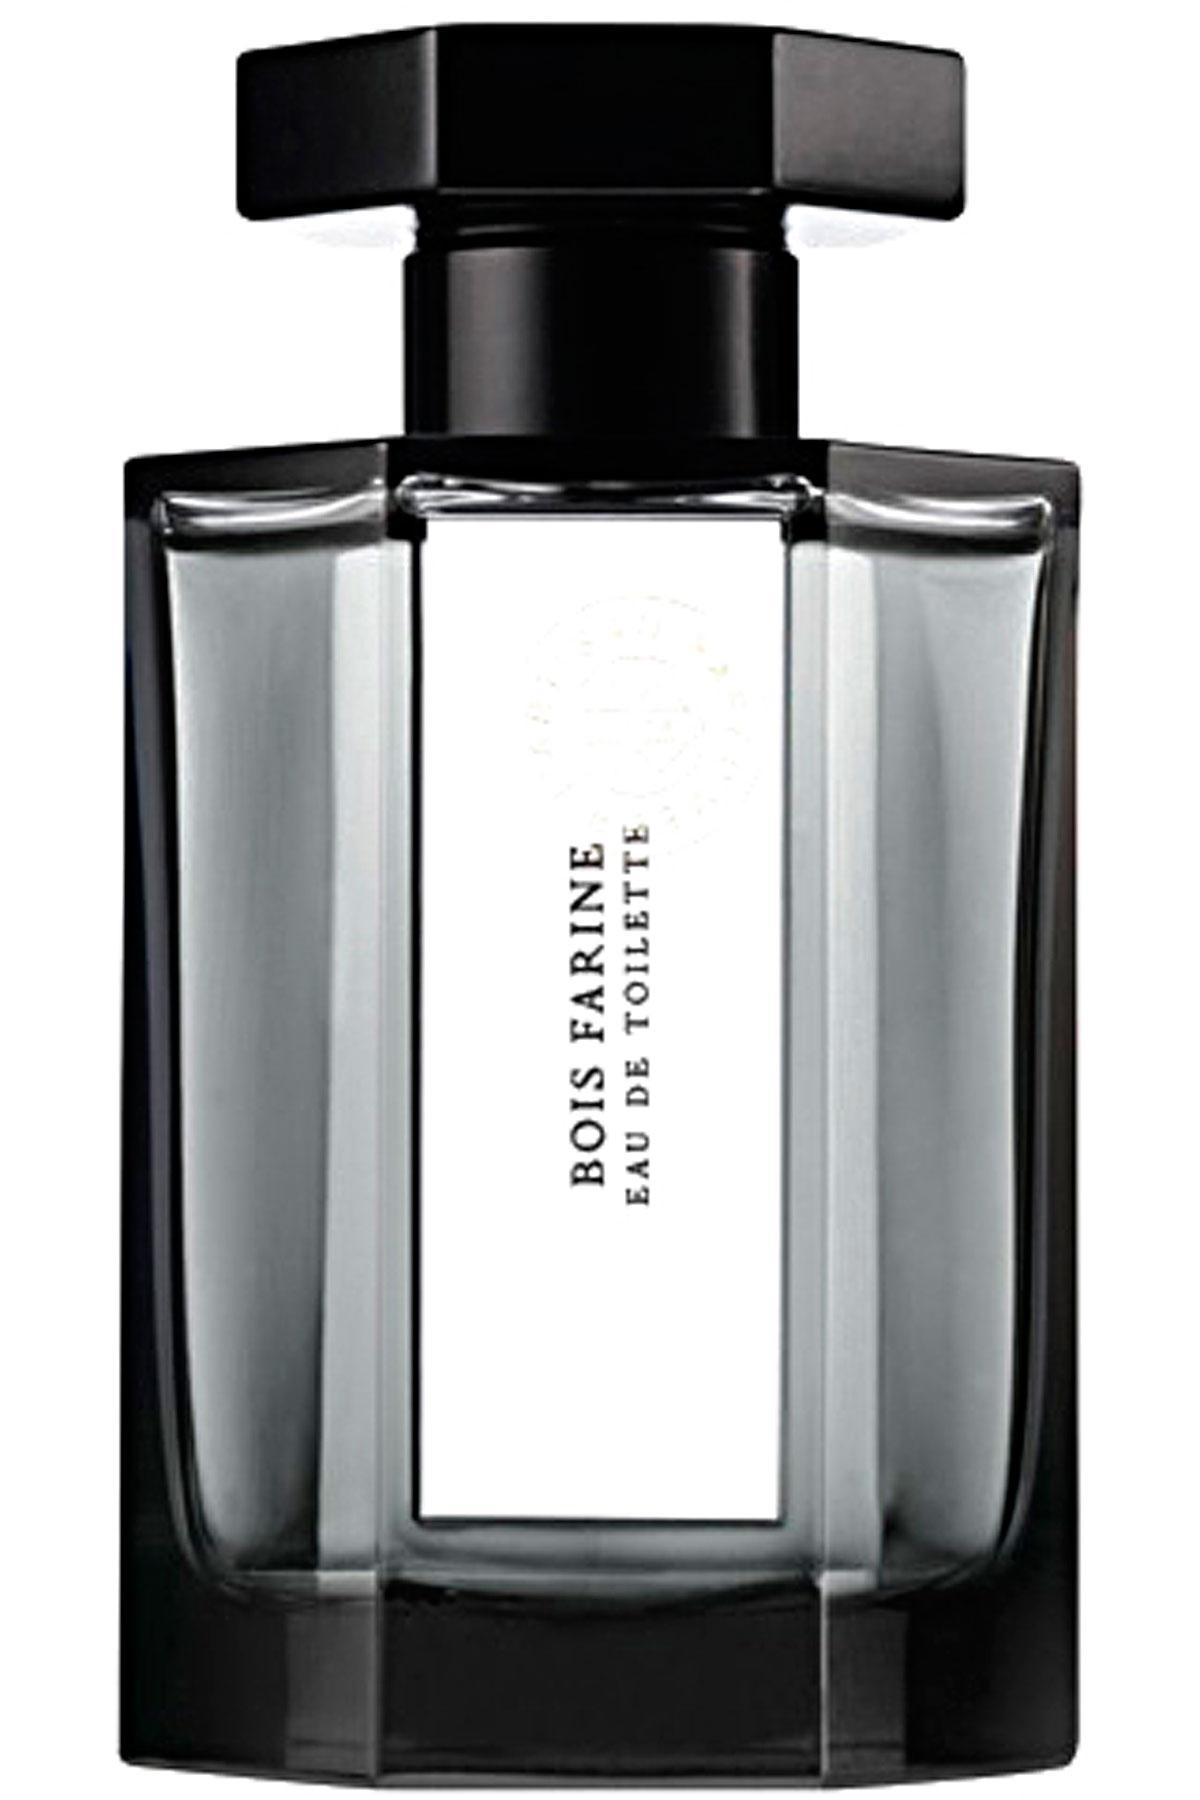 Artisan Parfumeur Fragrances for Women, Bois Farine - Eau De Toilette - 100 Ml, 2019, 100 ml